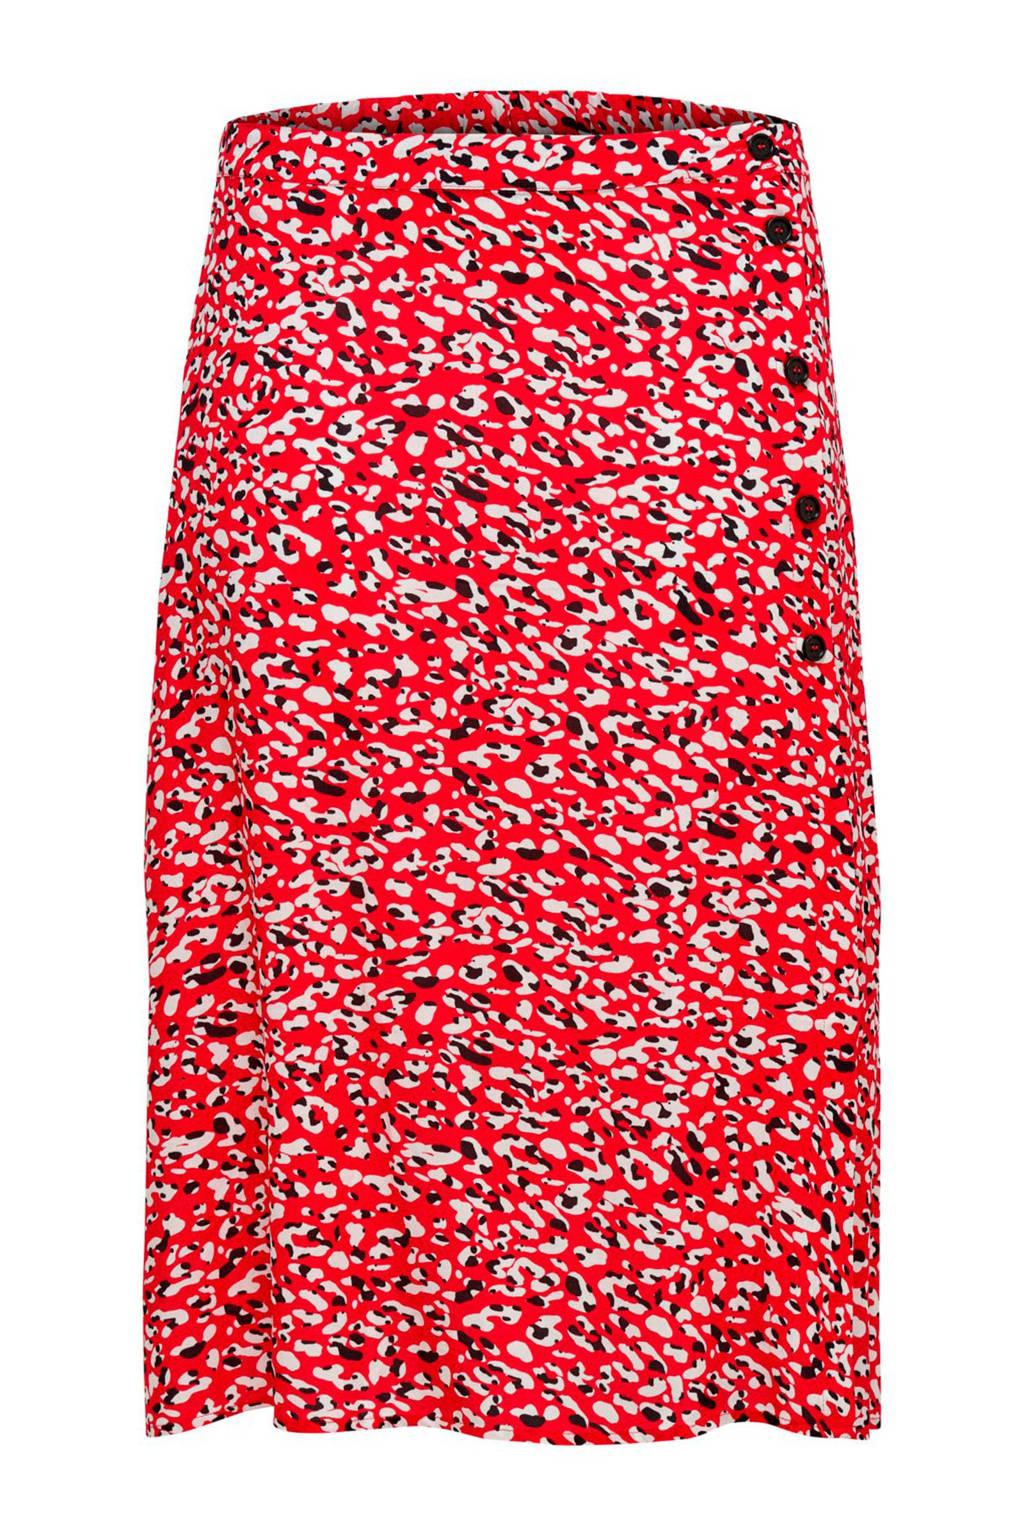 ONLY carmakoma rok met panterprint rood, Rood/ecru/zwart